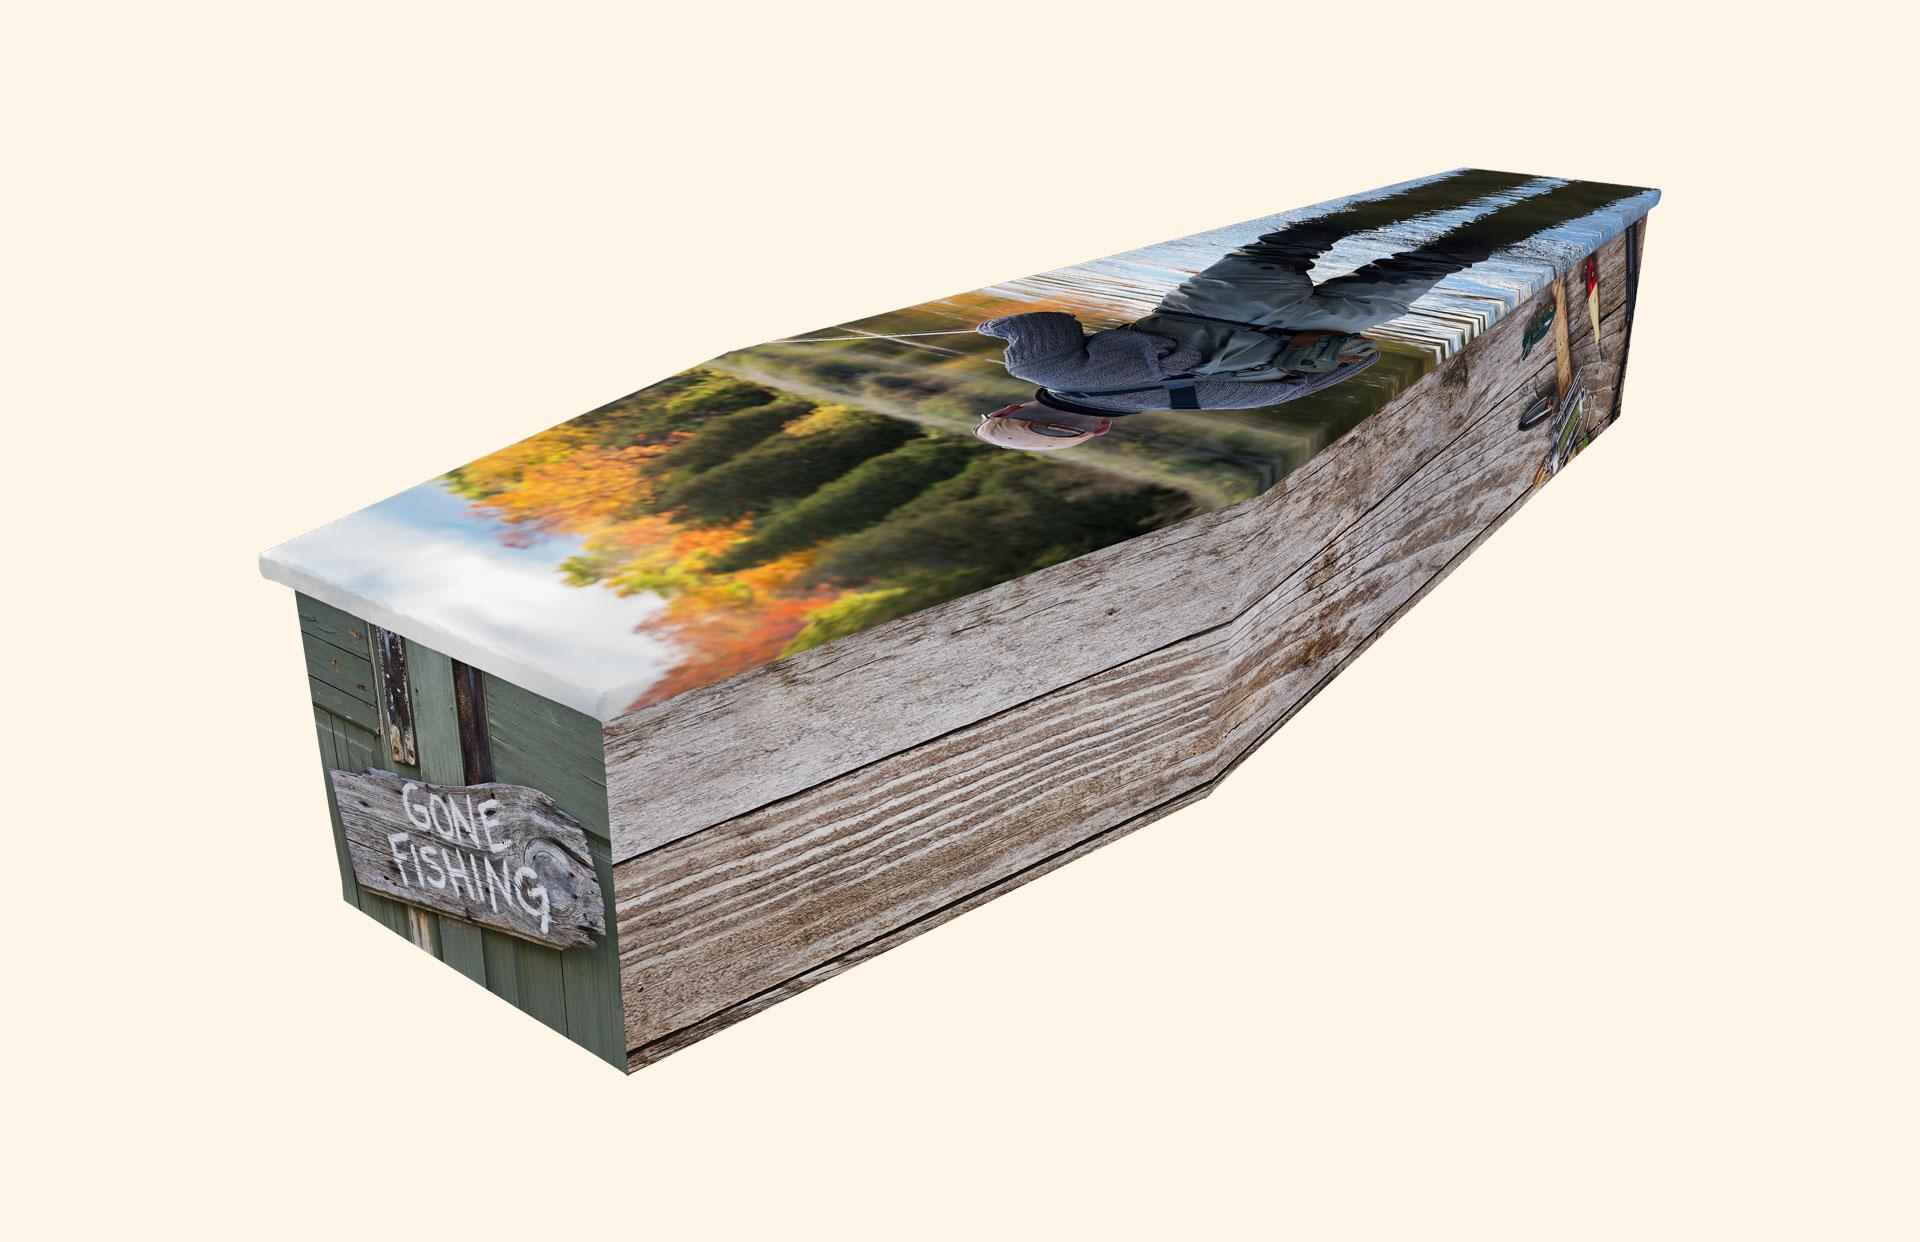 Fishing Tackle cardboard coffin